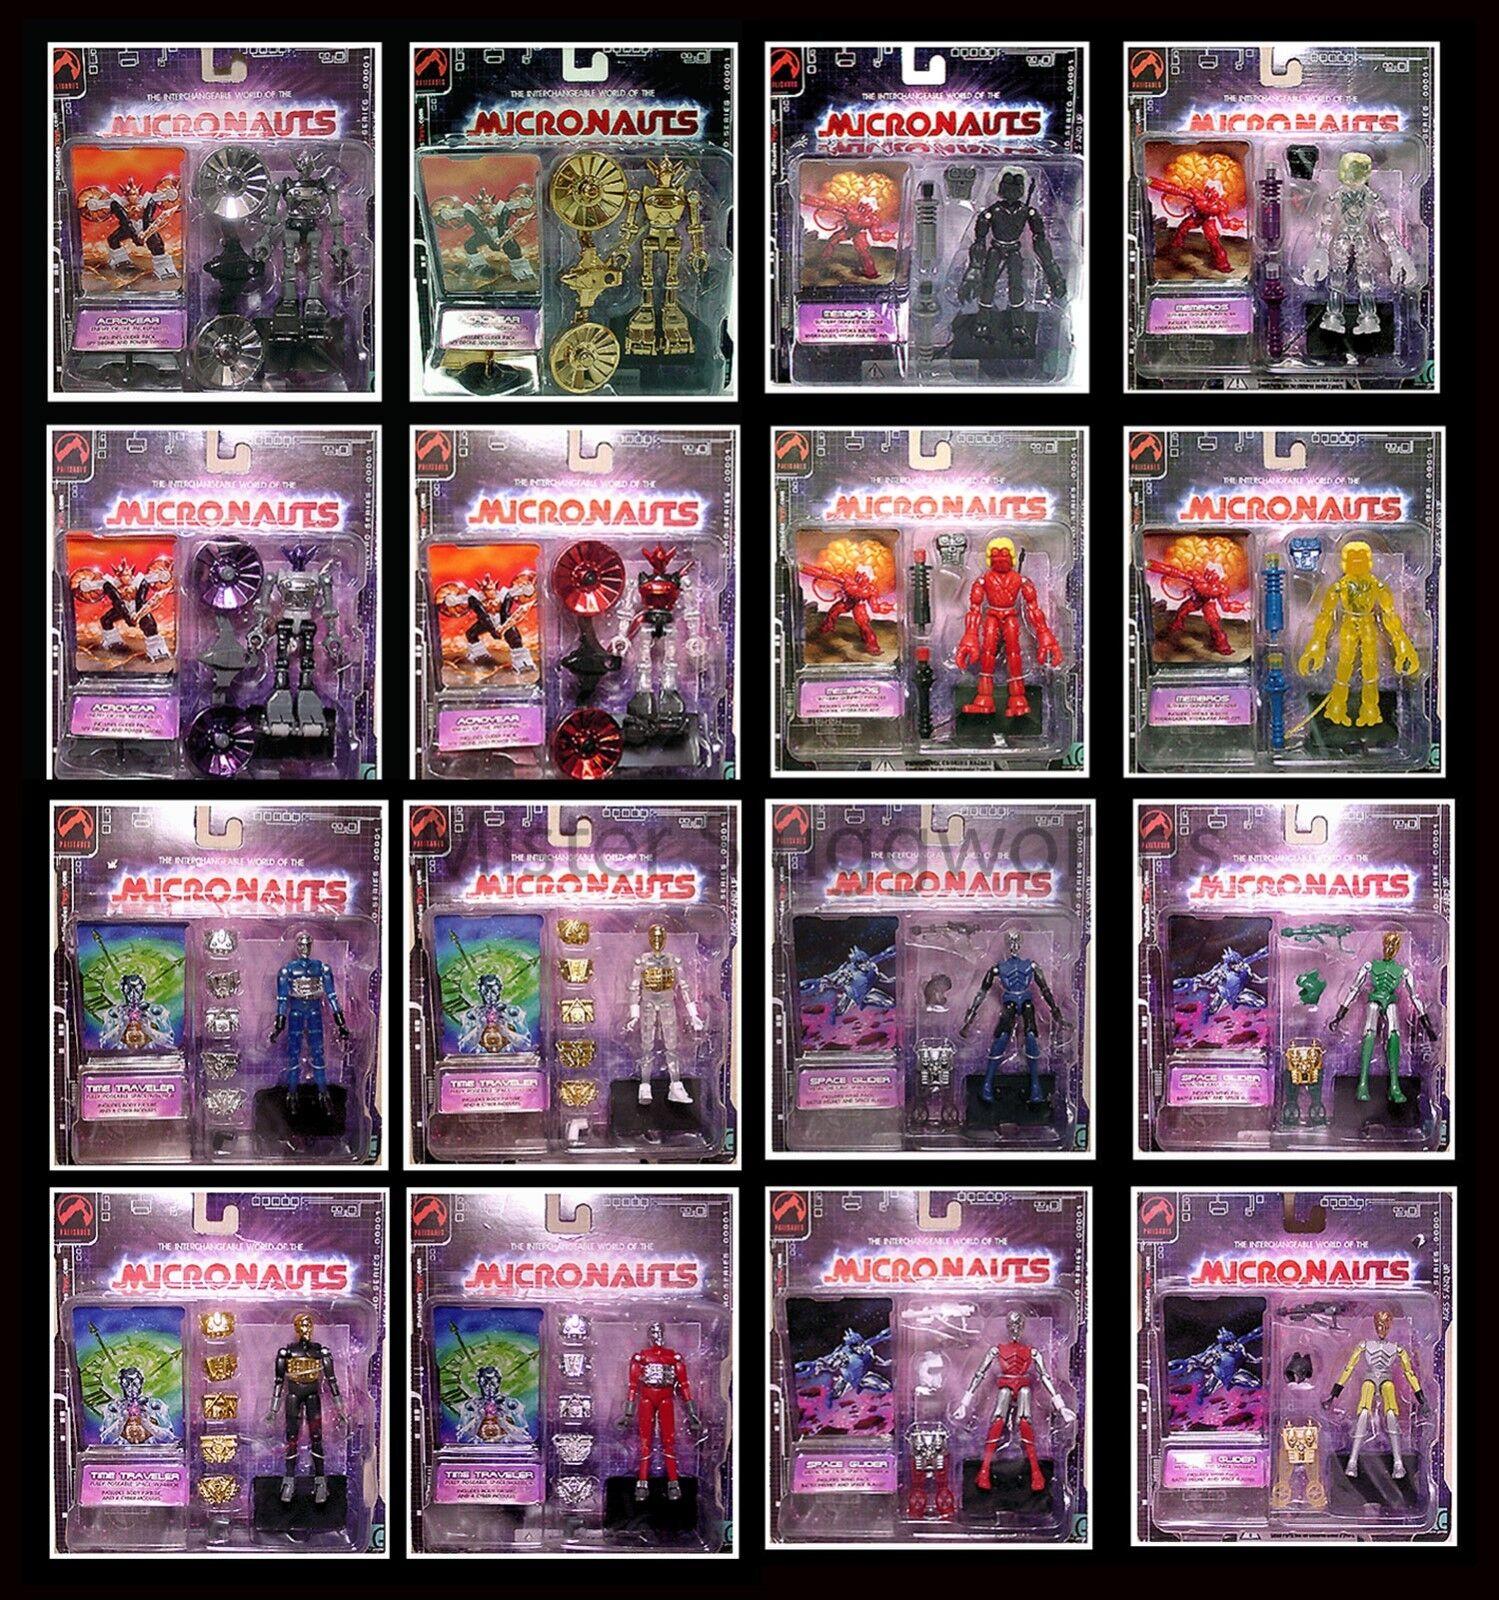 NEW Micronauts Microman Palisades 2002 Series 1 Set of 16 MOC Case MIB Rare